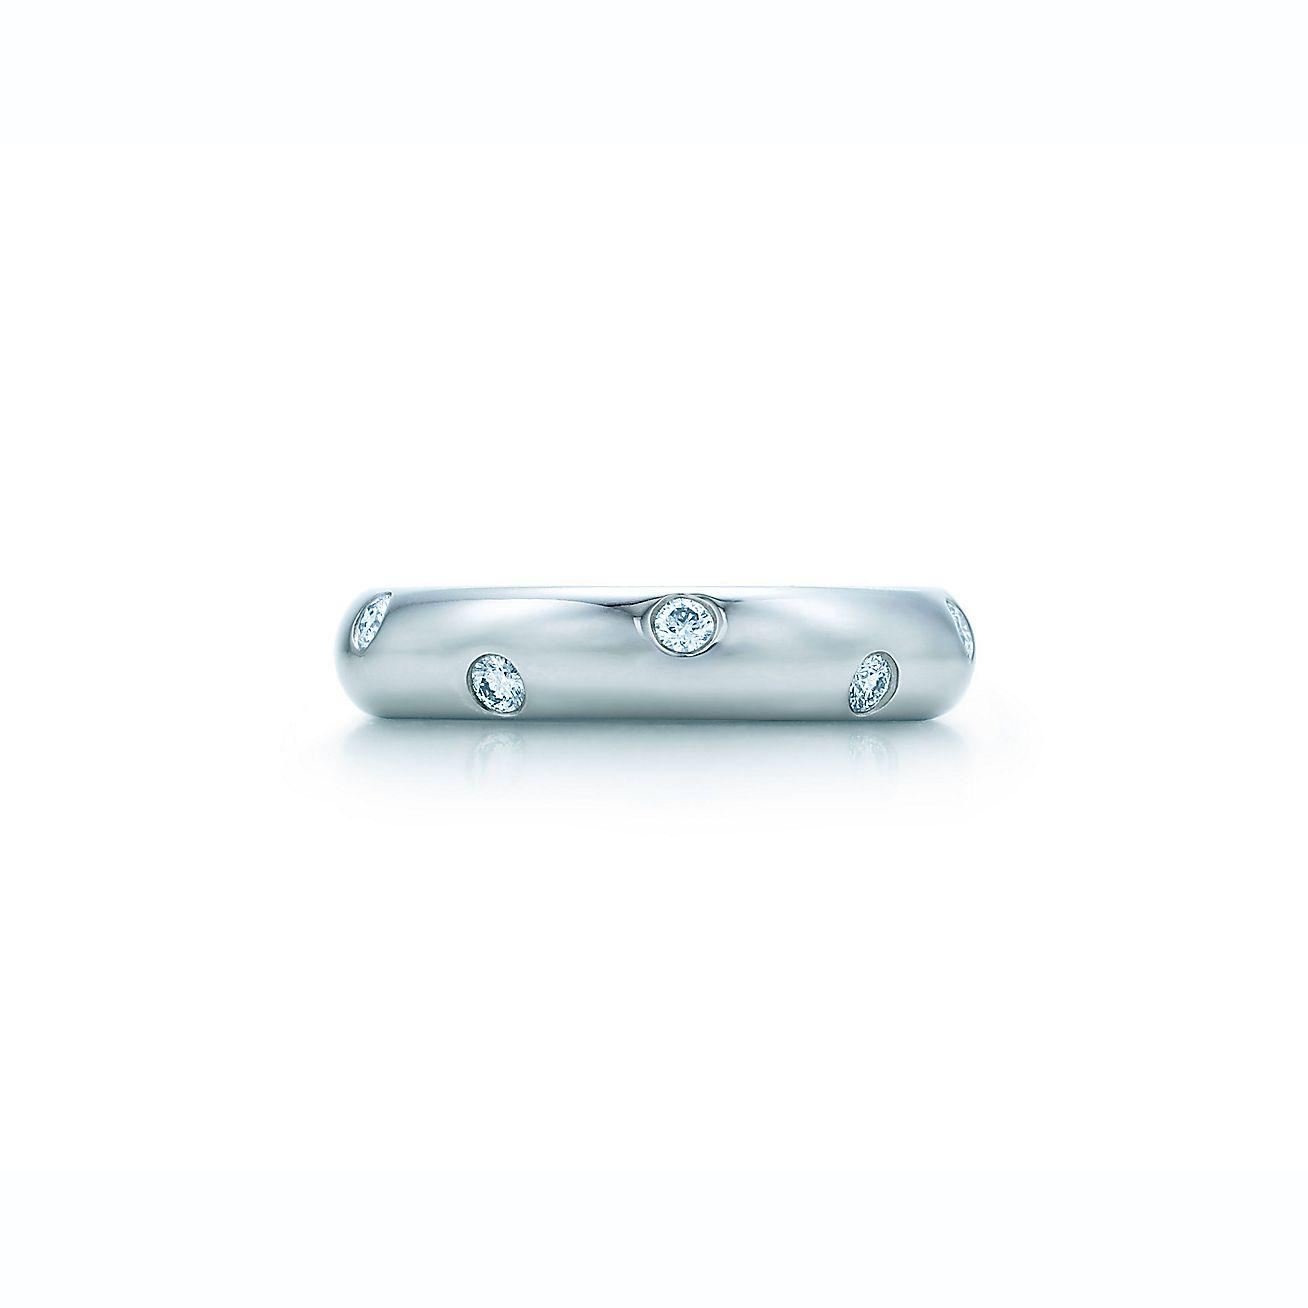 Tiffany Co Platinum Lucida 2mm Wedding Band Ring Sz 8: Etoile Band Ring With Diamonds In Platinum.